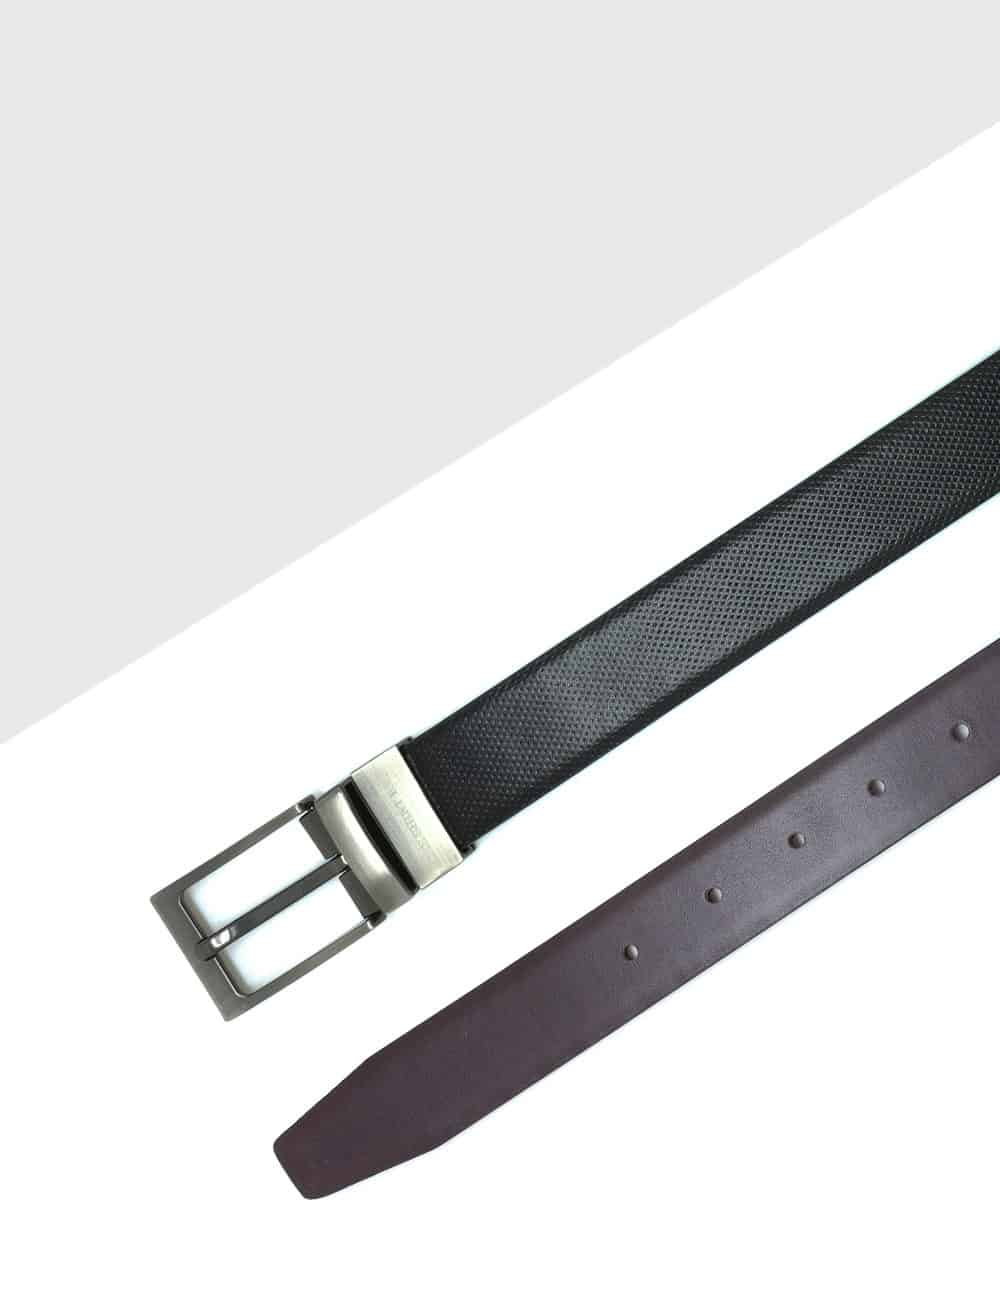 Black / Dark Brown Reversible Leather Belt LBR5.8